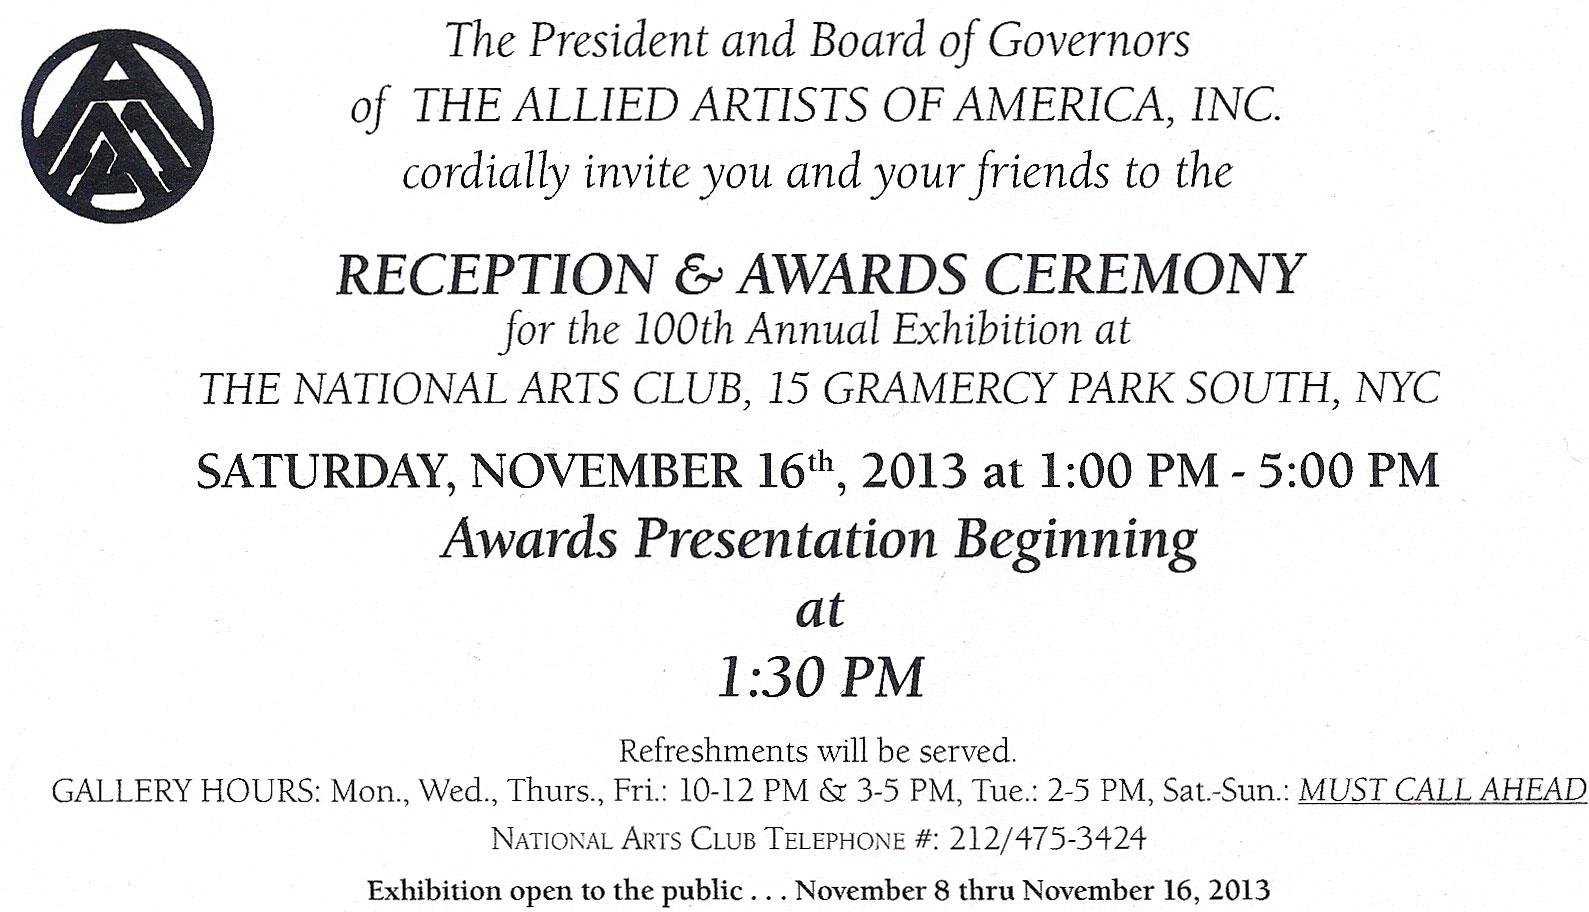 Allied-Artists-Nov-2013-Exhibition-Invite.jpg